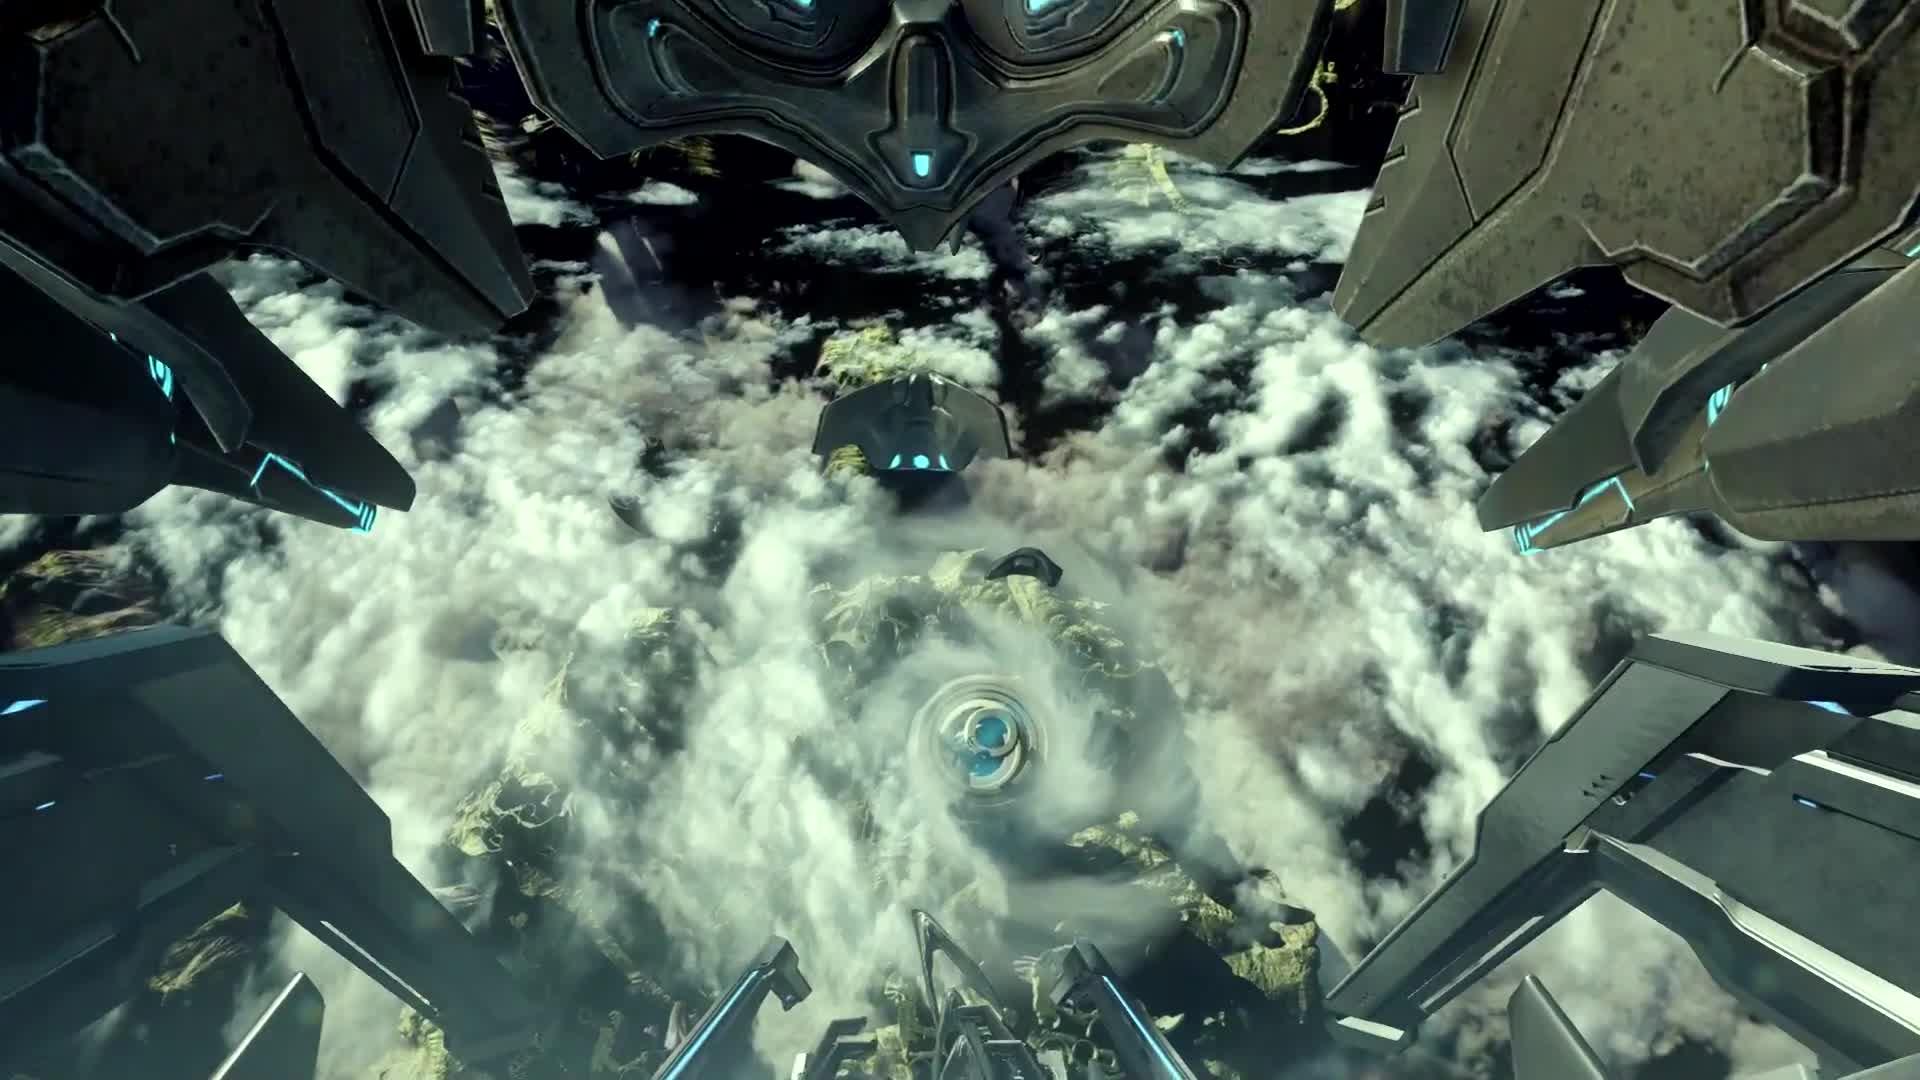 Gaming, Halo 5 Genesis, Halo 5 Guardian Jump, Halo 5 Guardians, SkyboxGuru, Halo 5 Guardians: Genesis GIFs